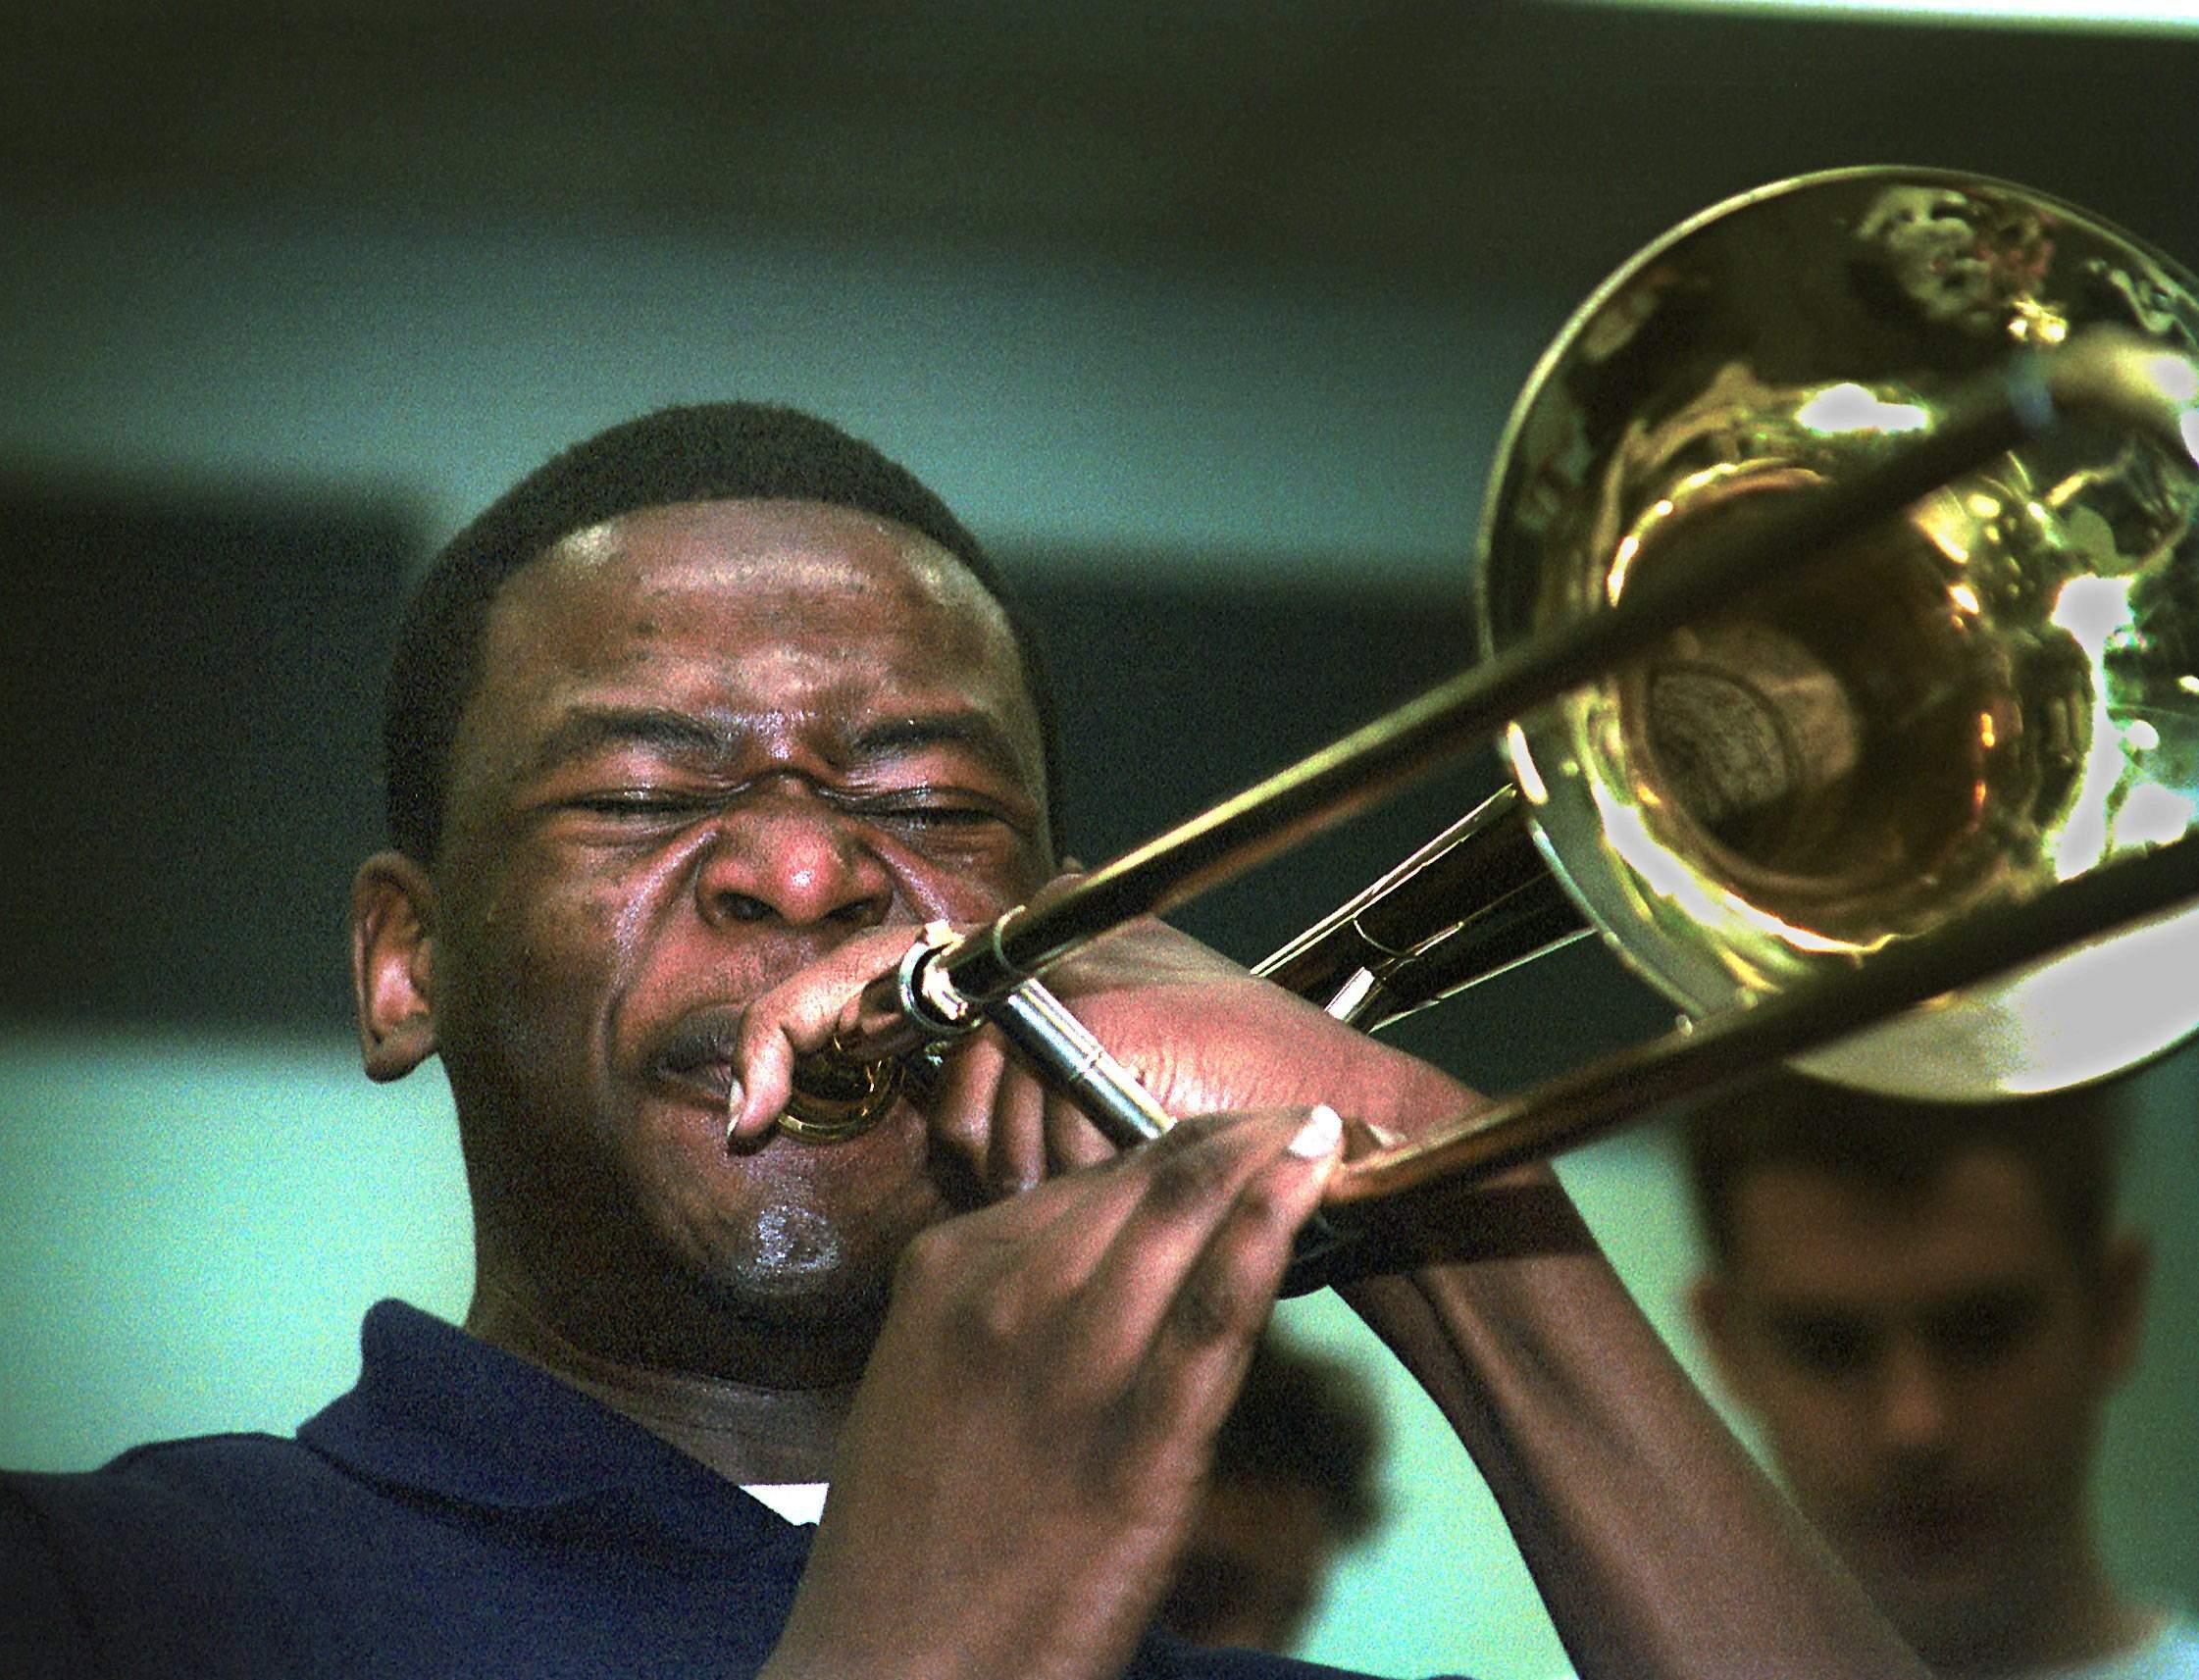 Ernest Stuart at 17, playing his trombone in 2001 as part of the Pennsauken High band. SHARON GEKOSKI-KIMMEL / Staff Photographer